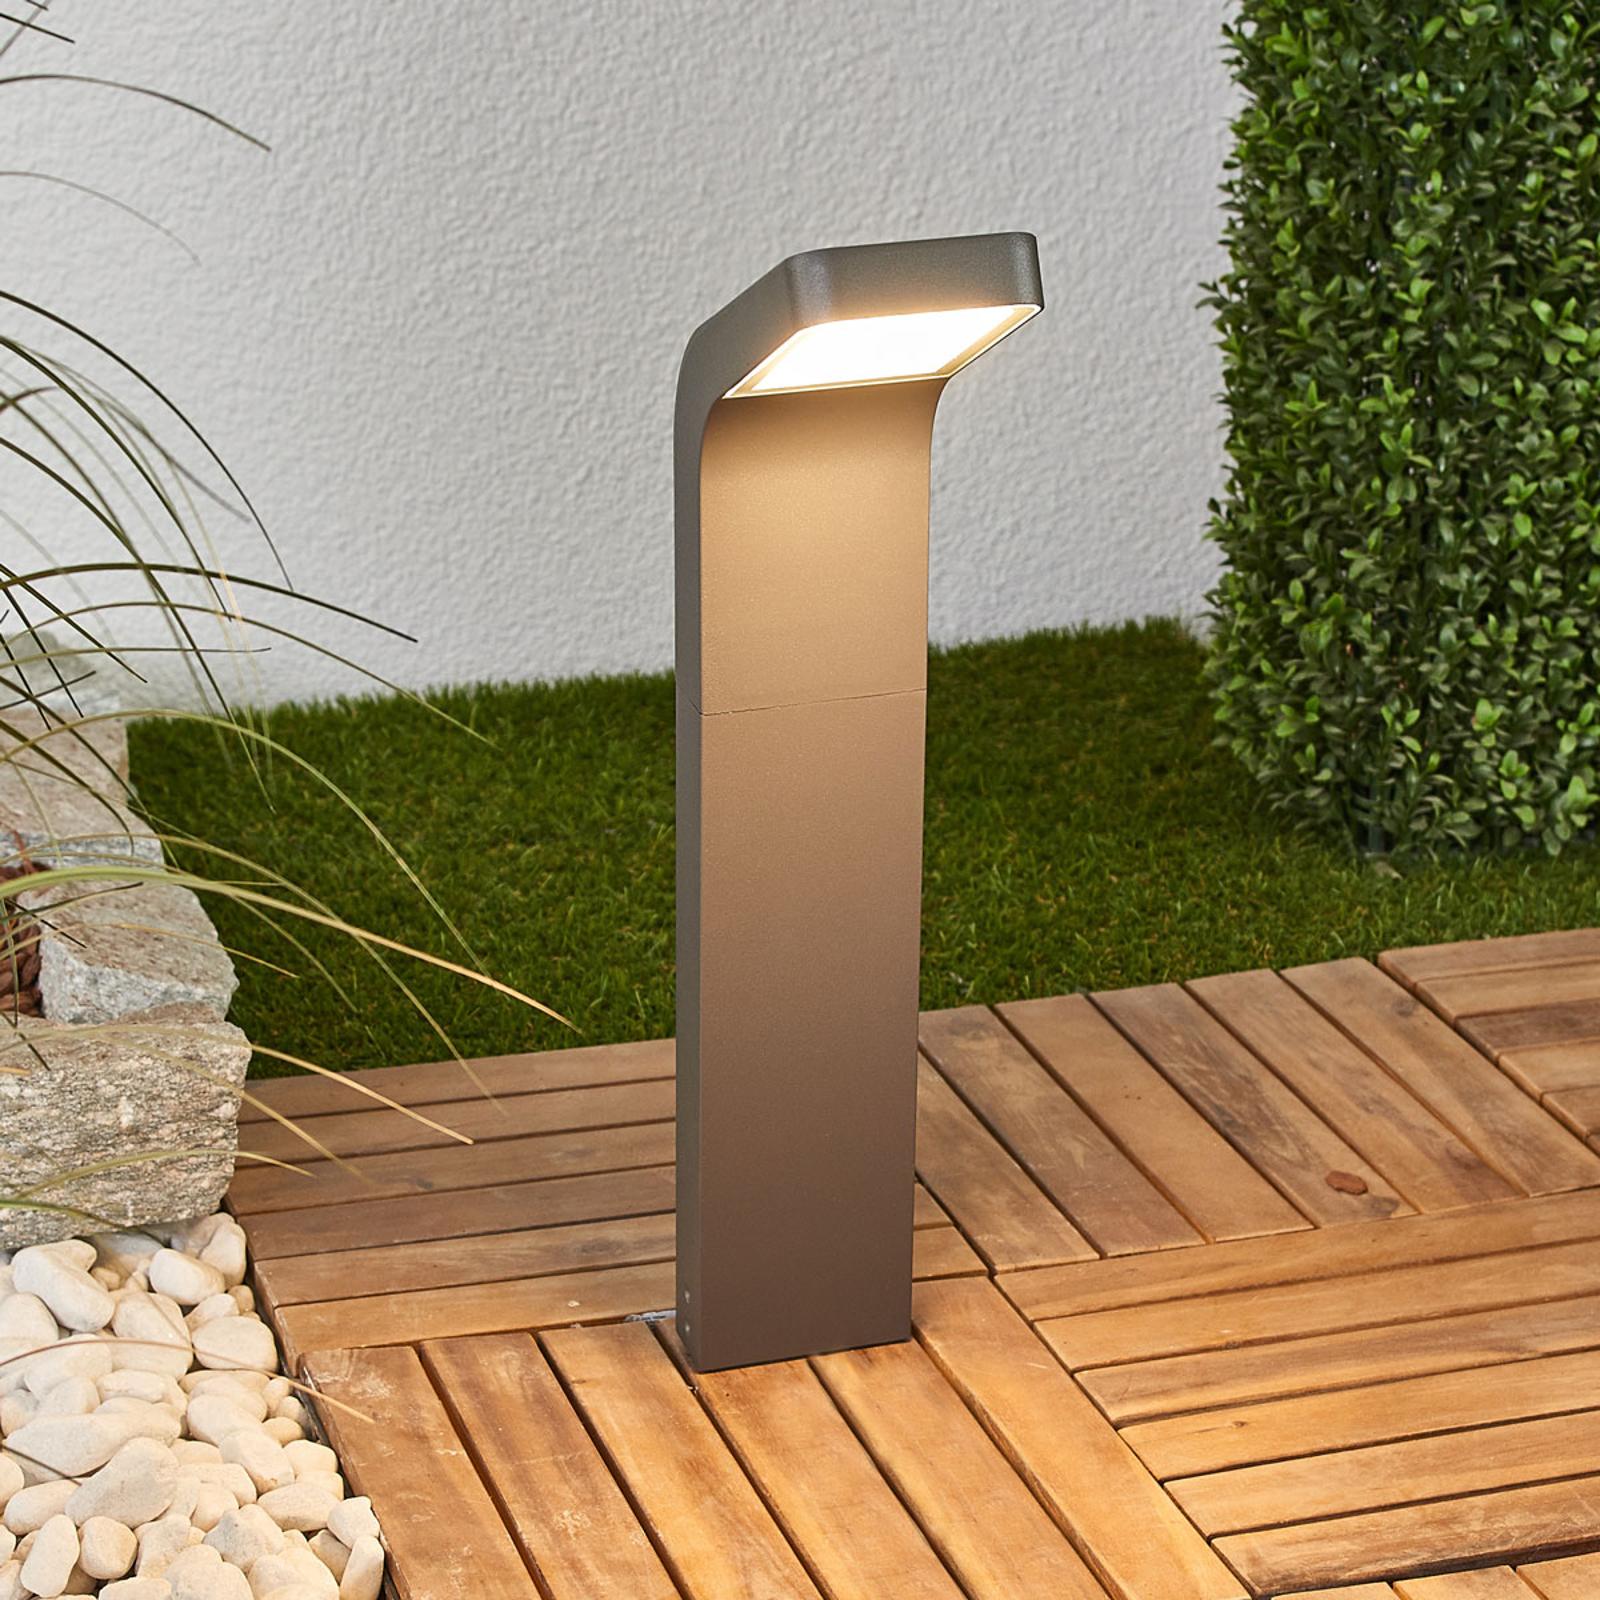 LED-Sockellampe Maddox, geneigt